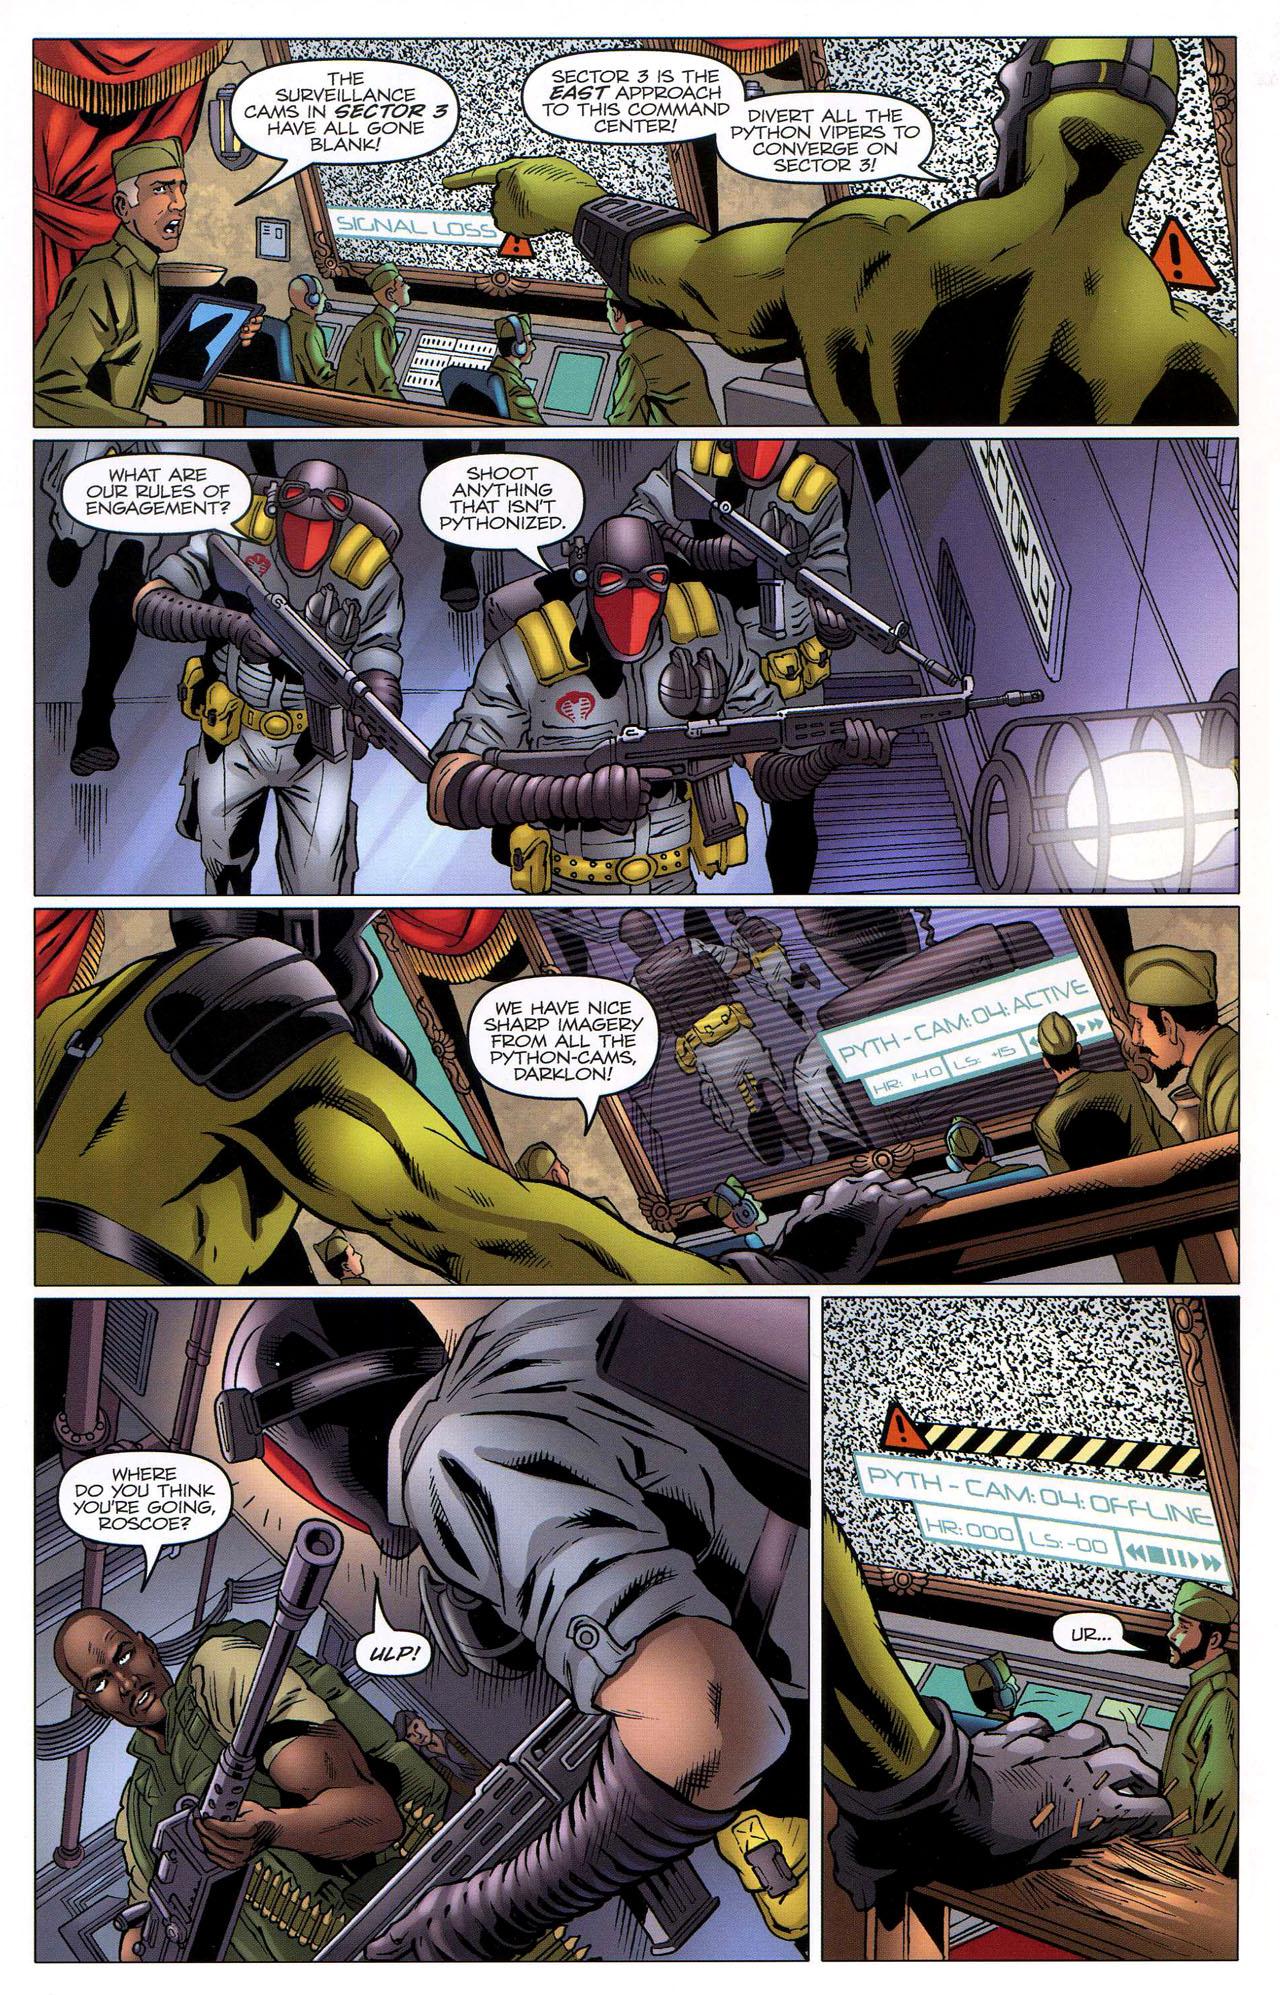 G.I. Joe: A Real American Hero 171 Page 15